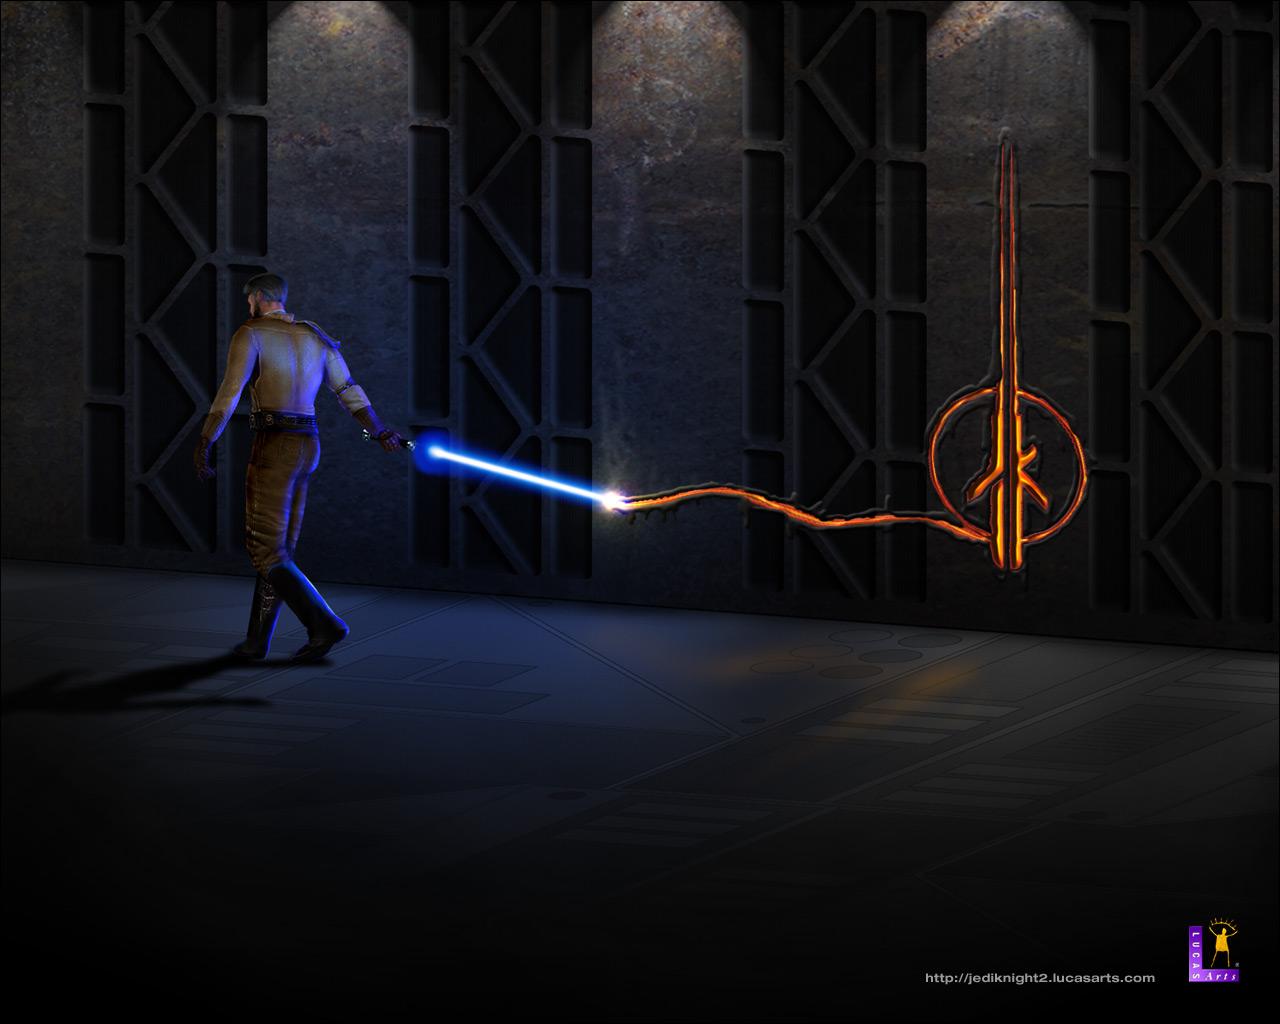 Star Wars Jedi Knight II   Jedi Outcast JK2 JO TapetkyCZ 1280x1024